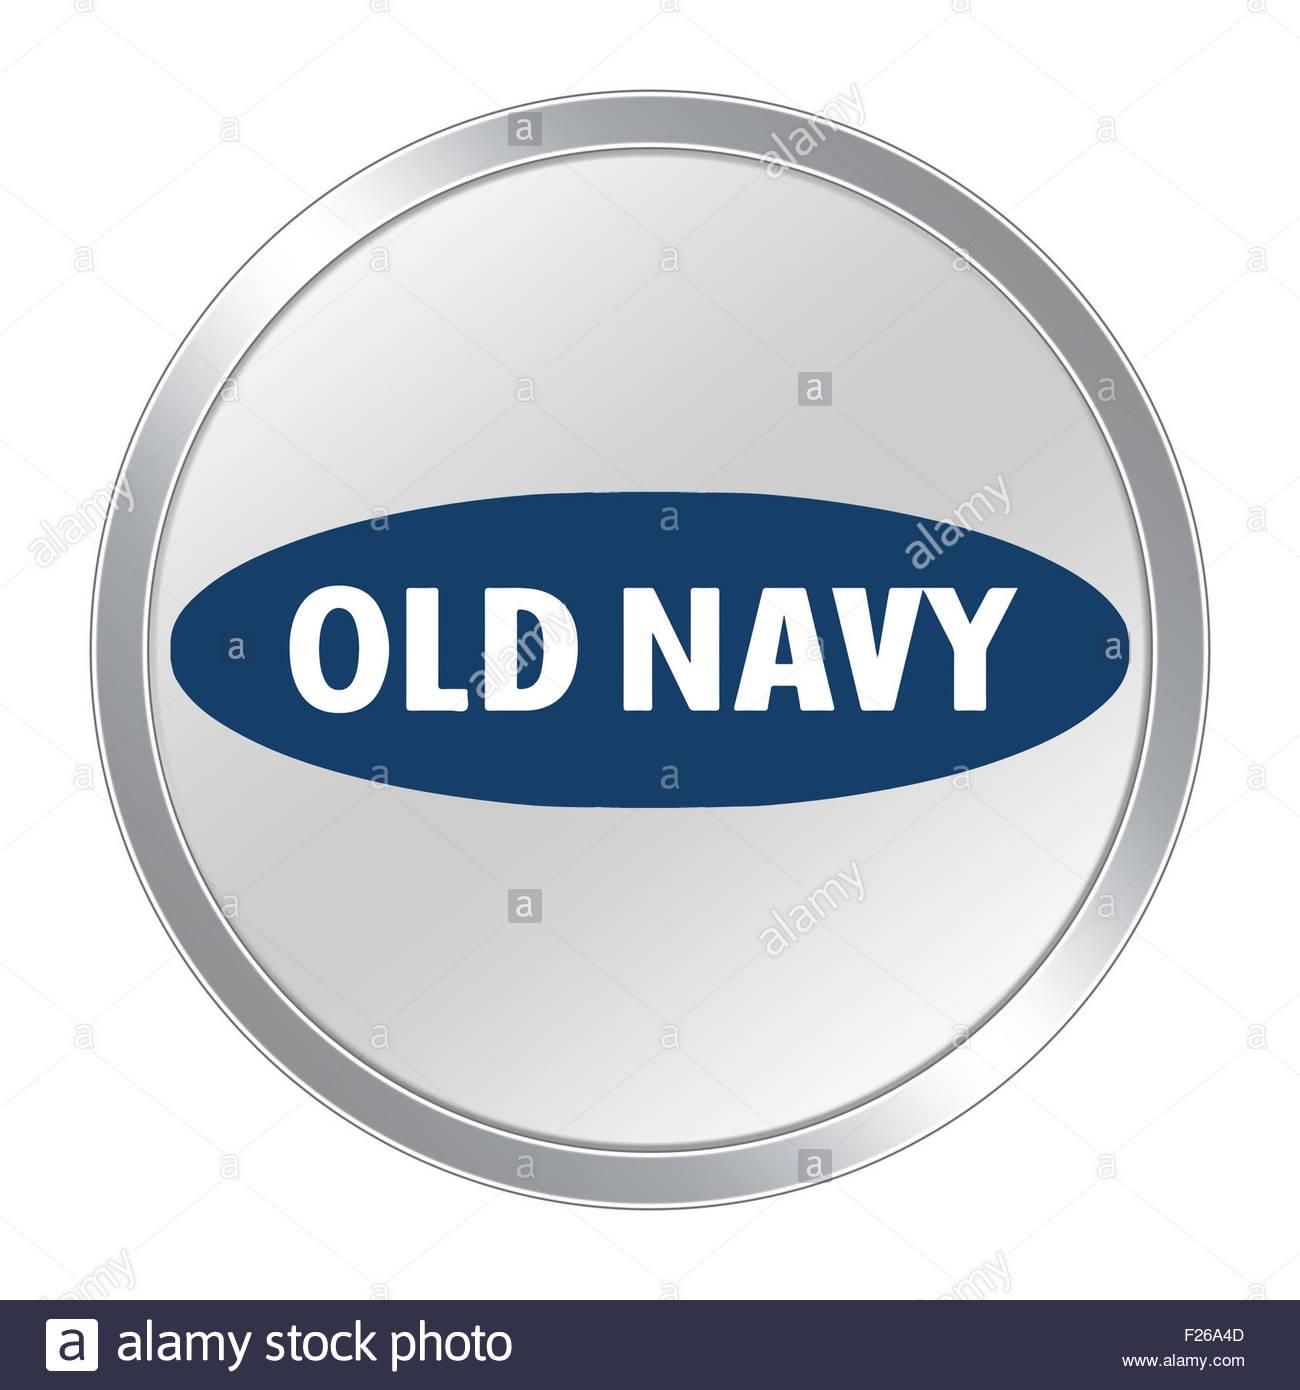 Old Navy logo icon button - Stock Image